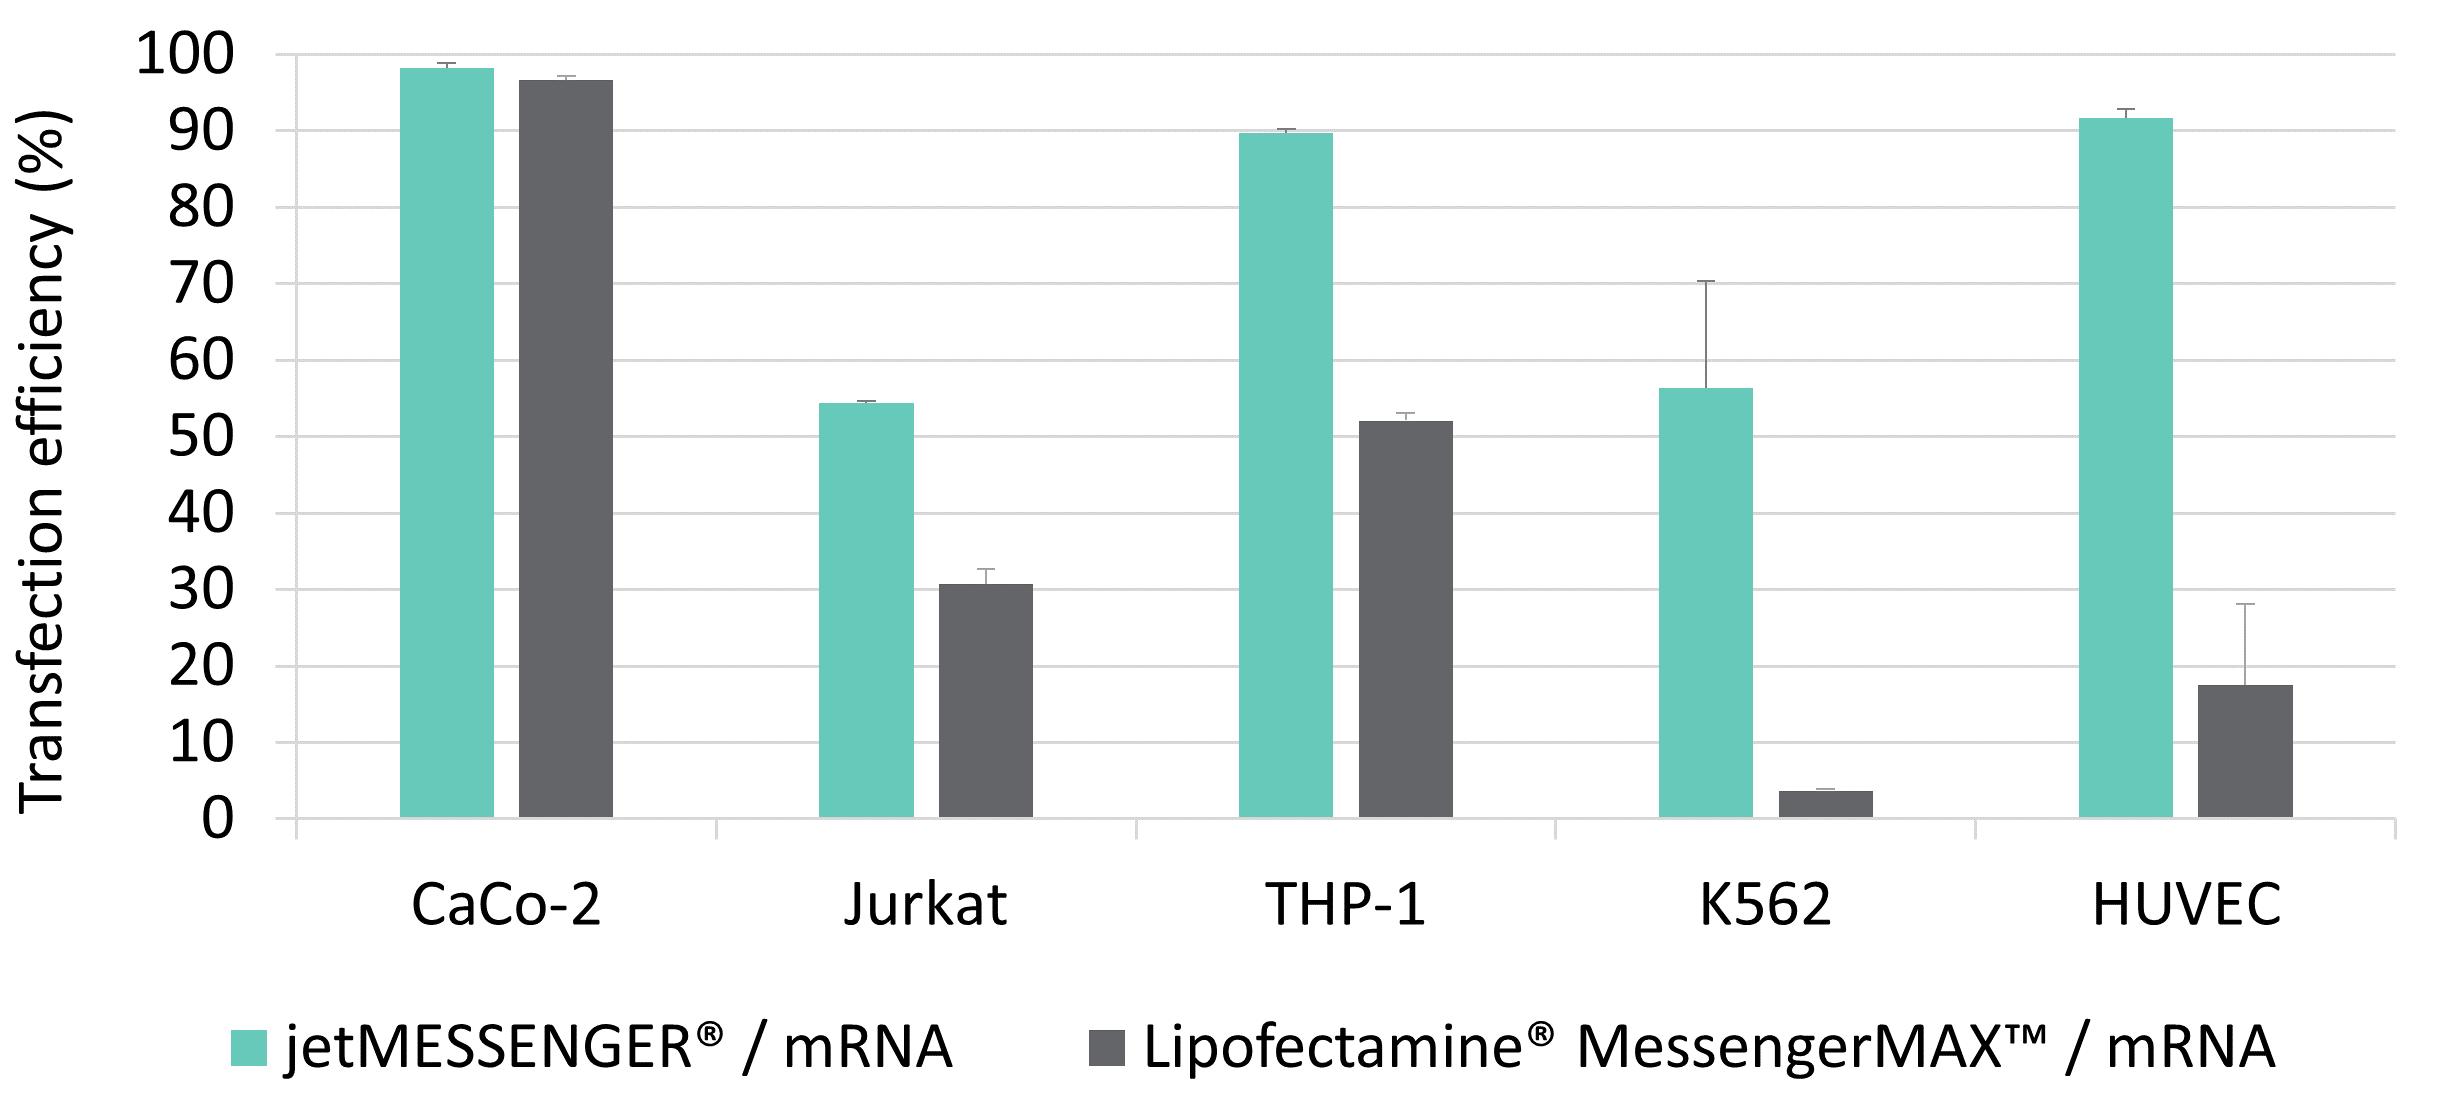 jetMESSENGER - mRNA comparison competitors